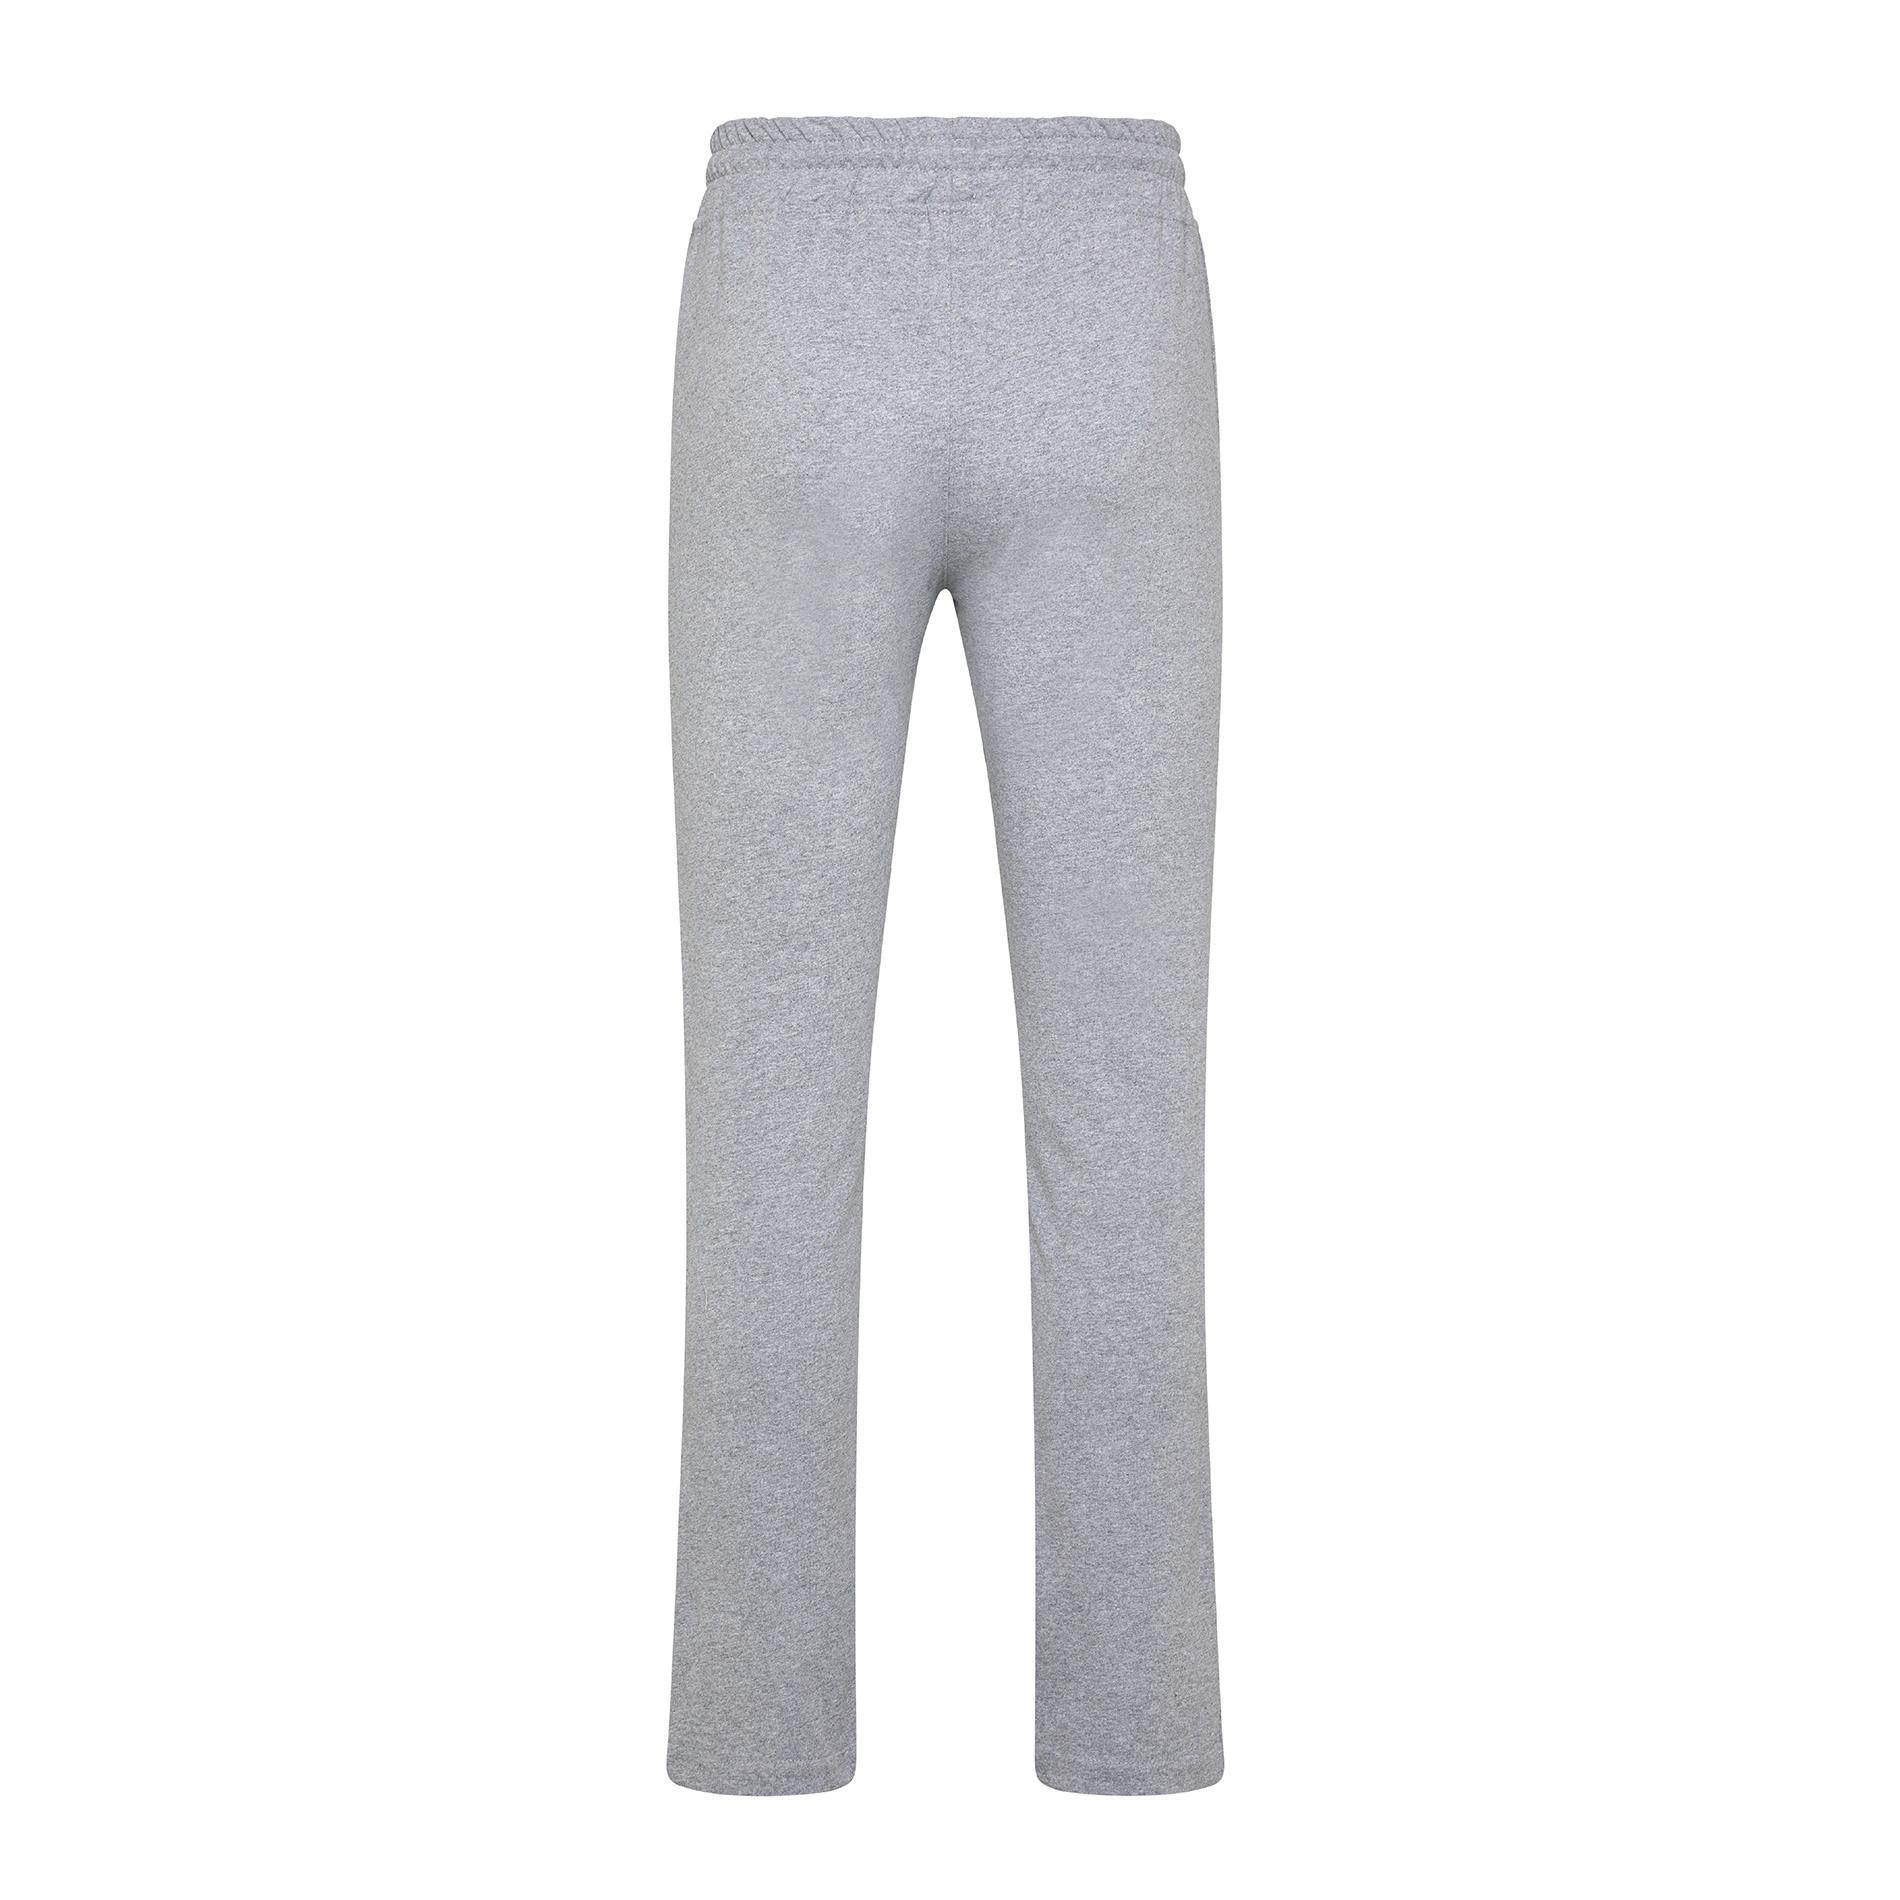 Pantalone felpa di cotone JCT, Grigio, large image number 1